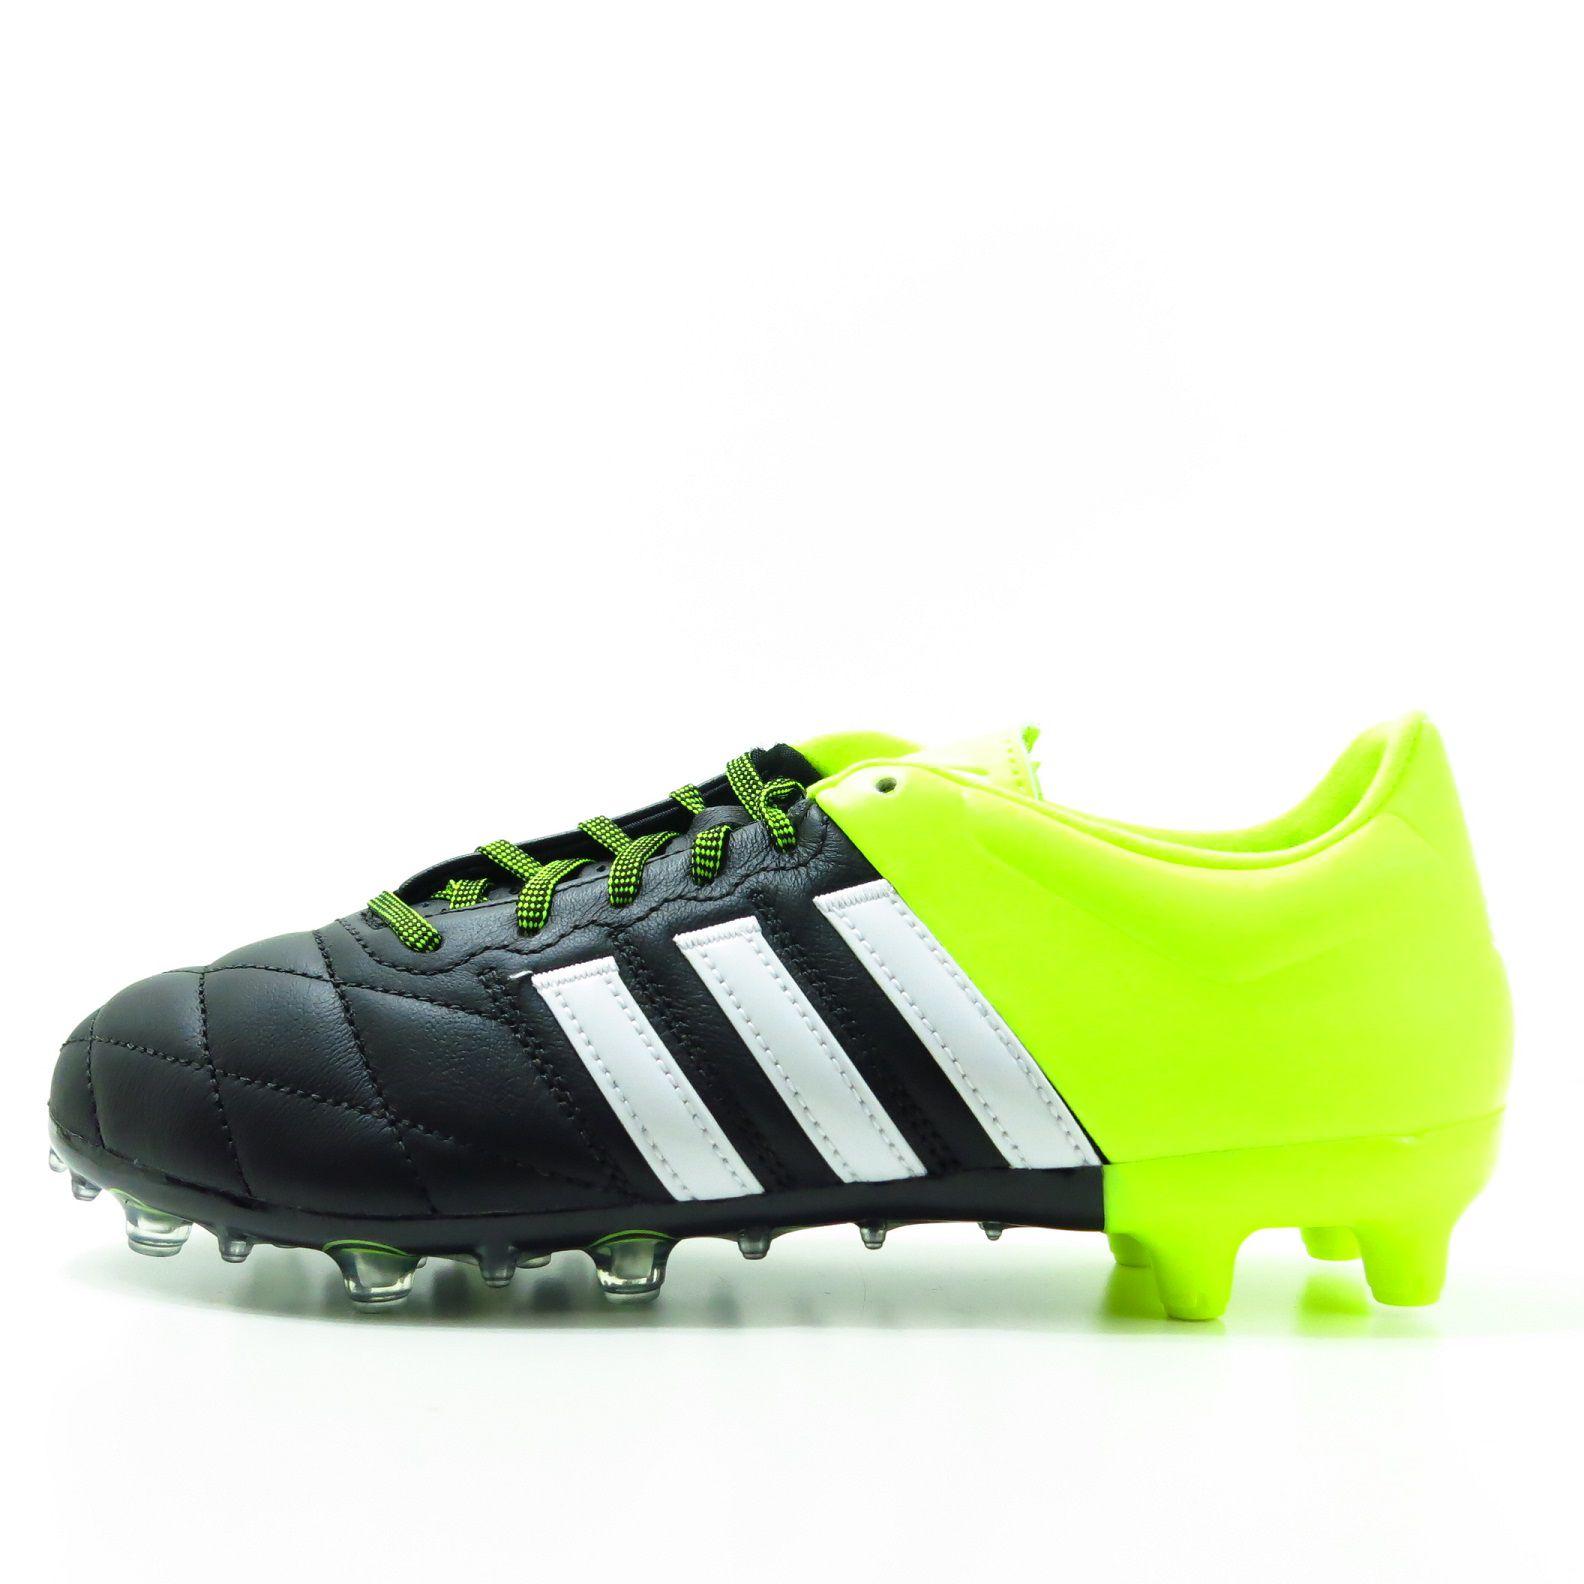 Chuteira Adidas Ace 15.2 FG - Couro